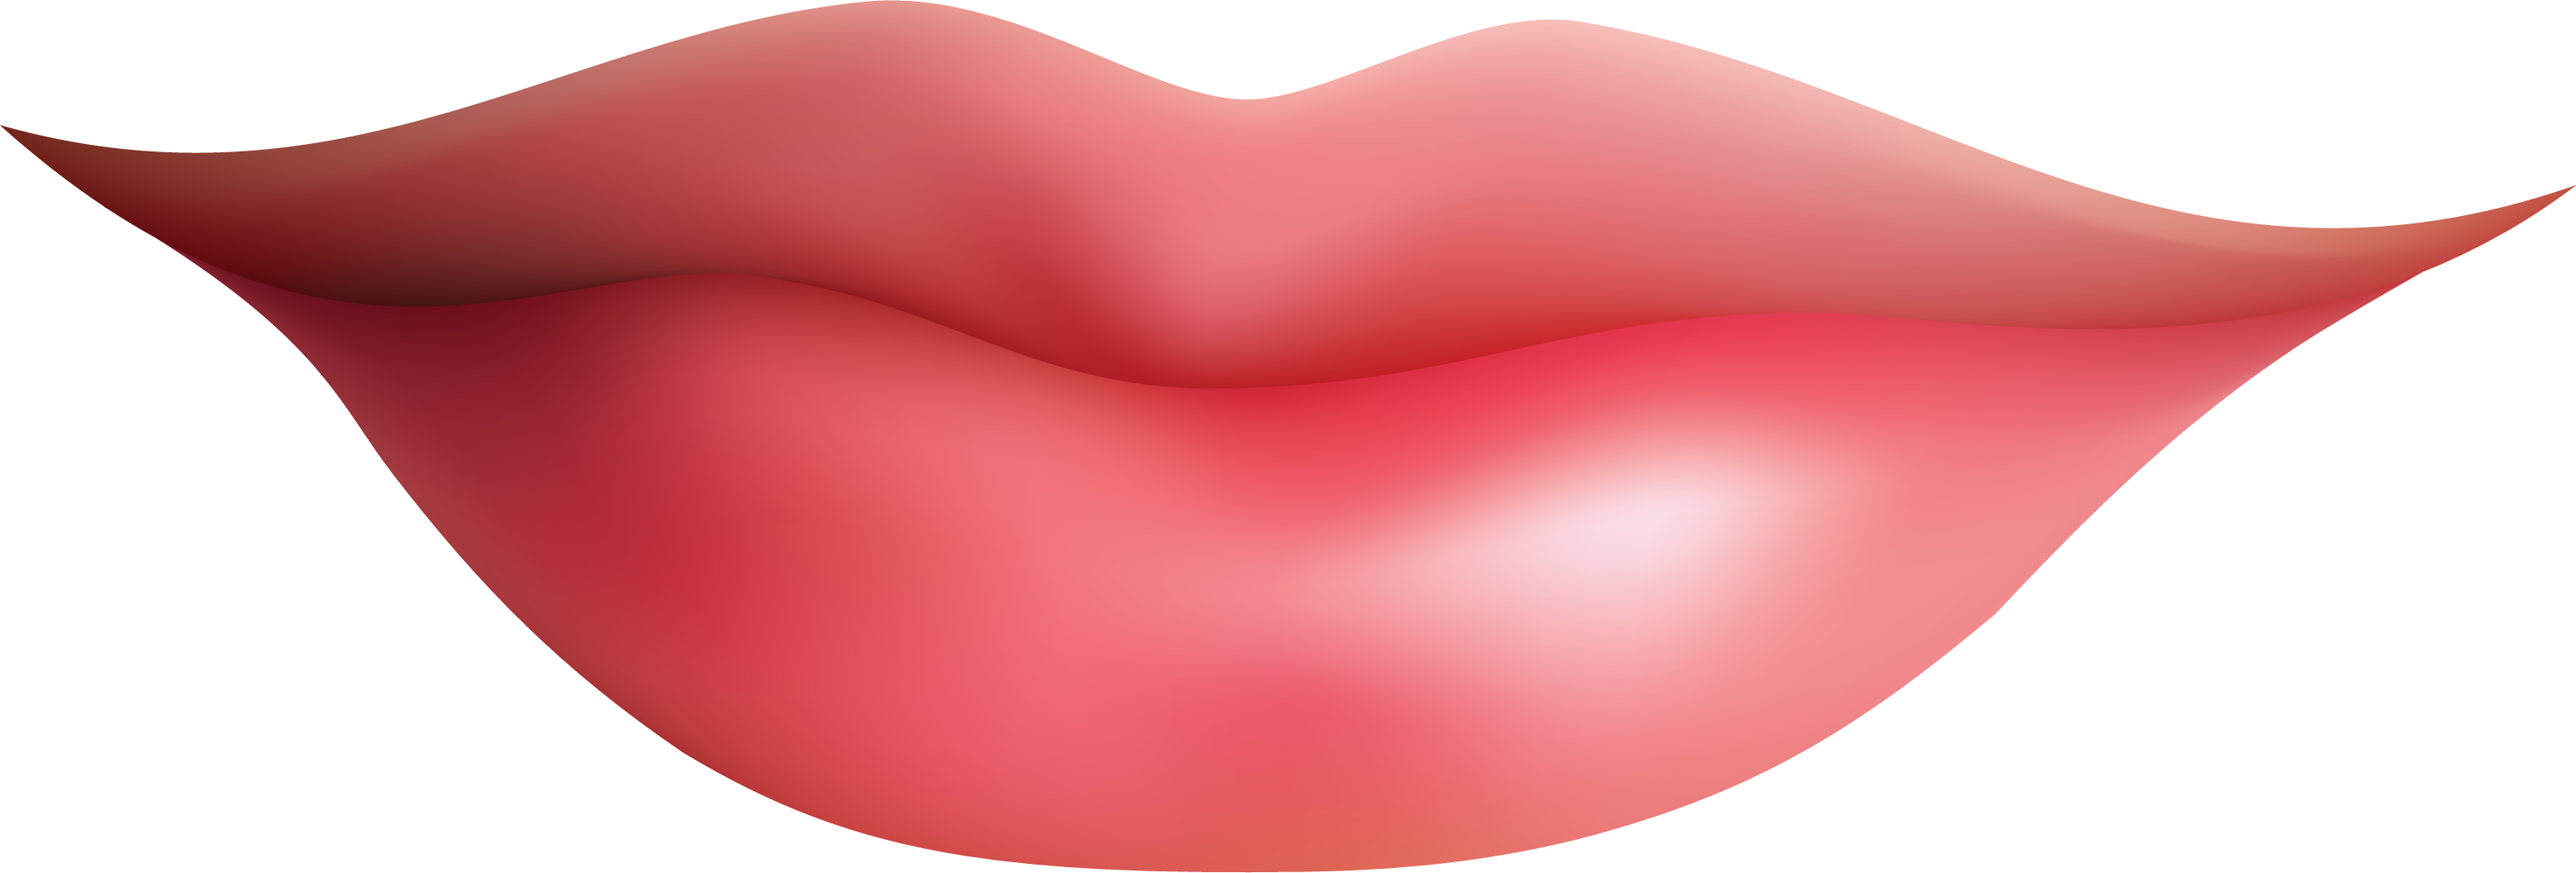 Lips Clipart